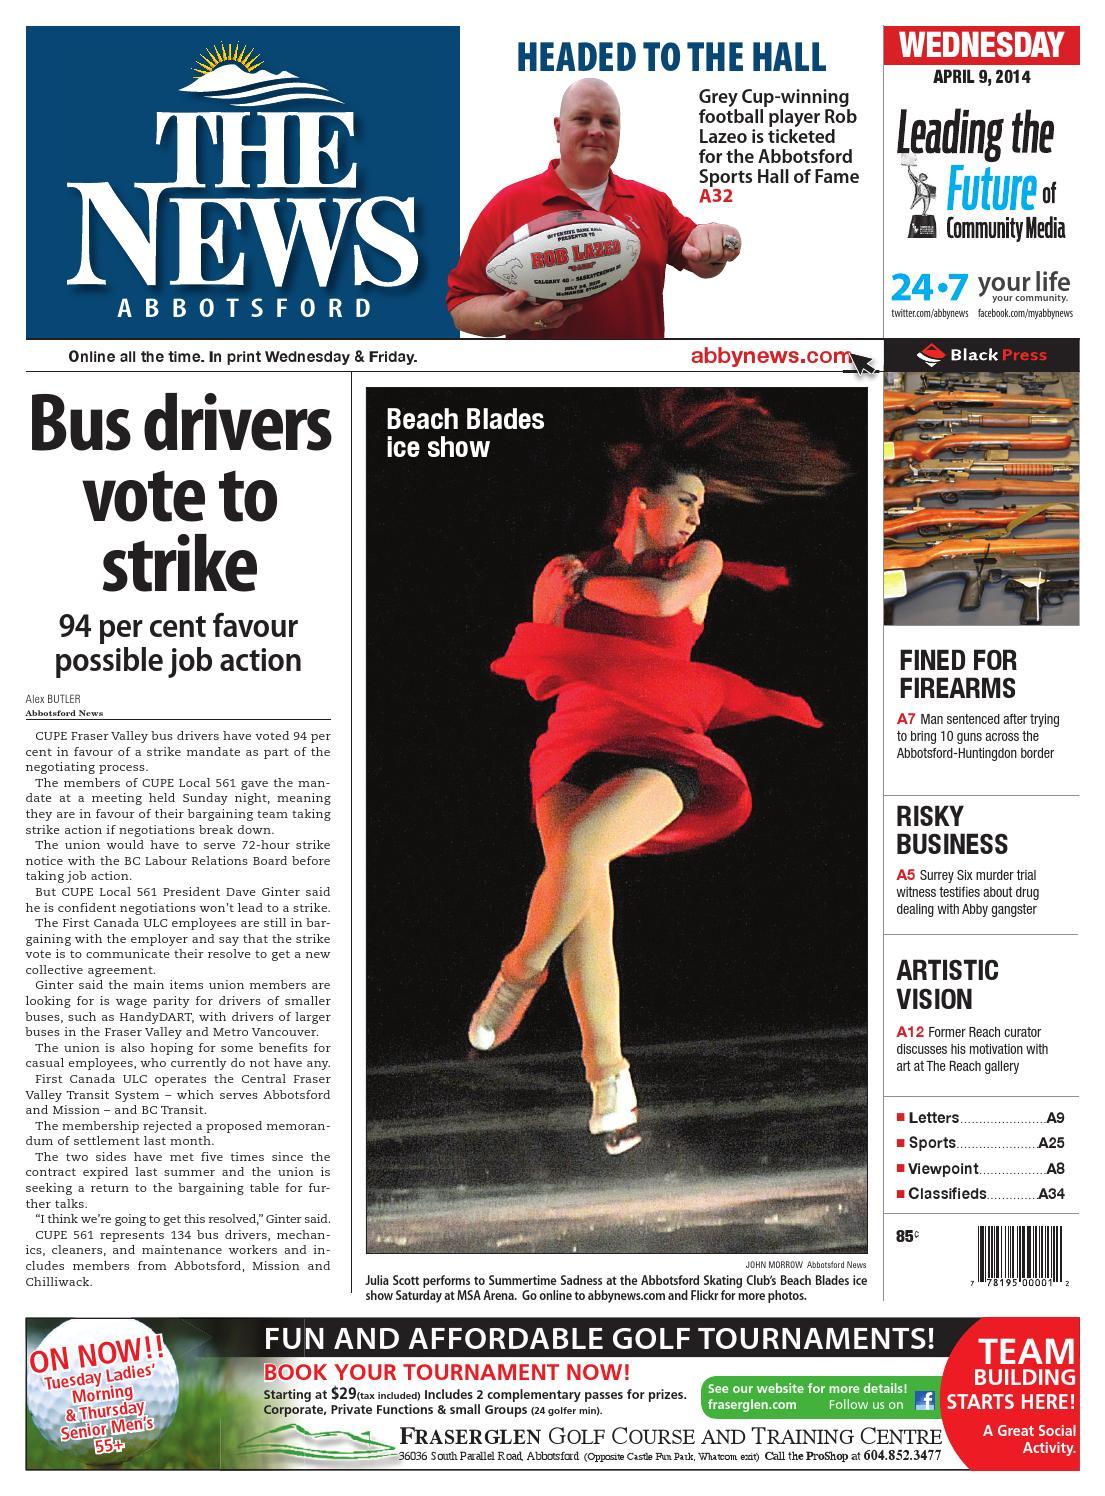 Abbotsford News, April 09, 2014 by Black Press Media Group